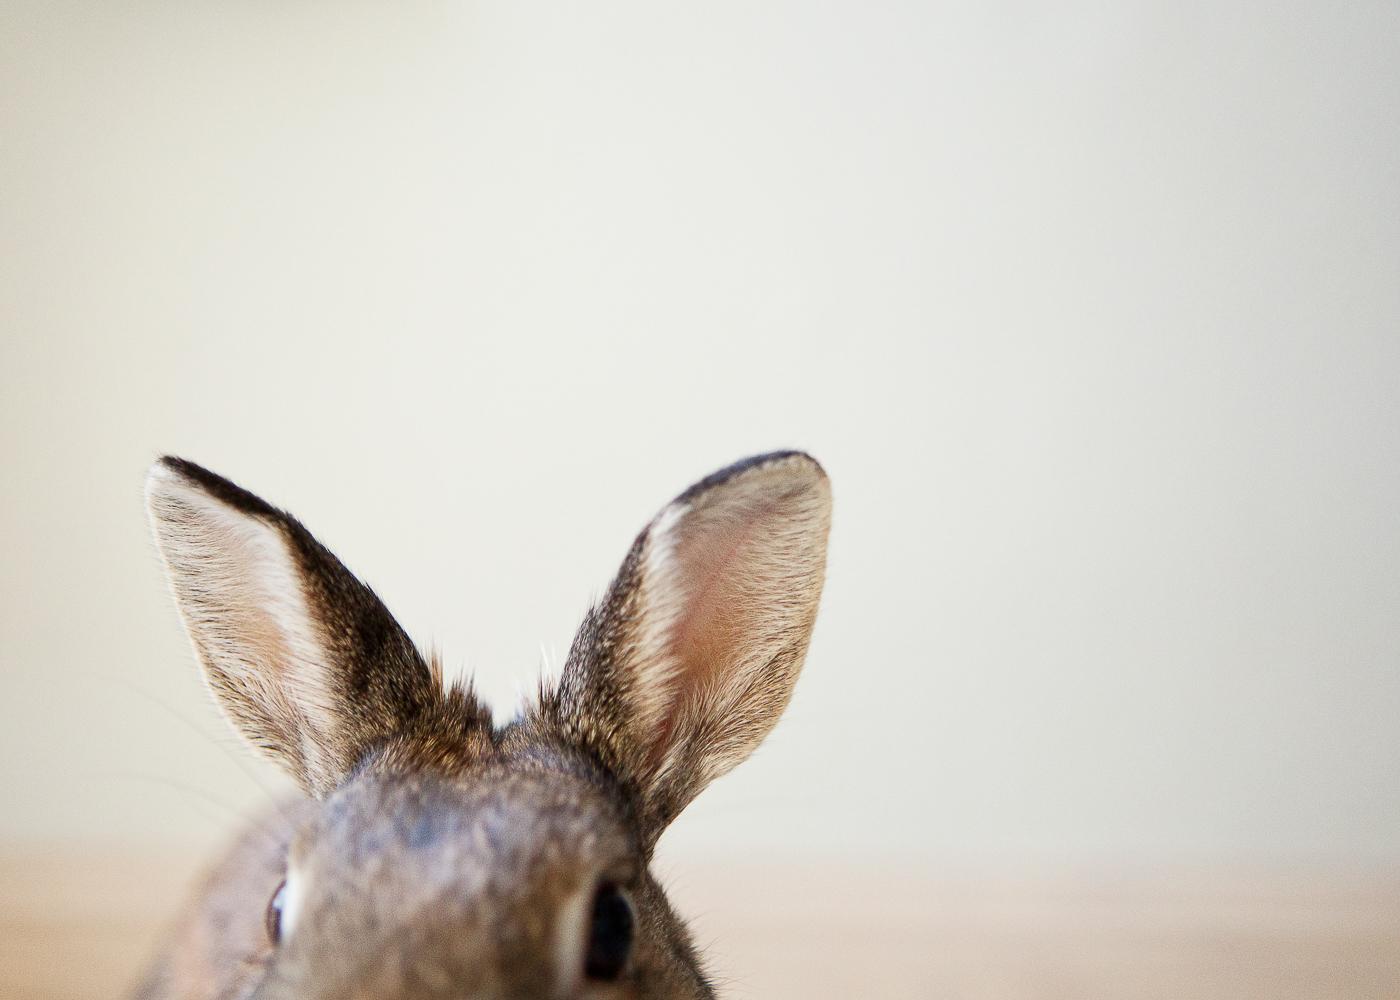 boulder house rabbit photos005.jpg